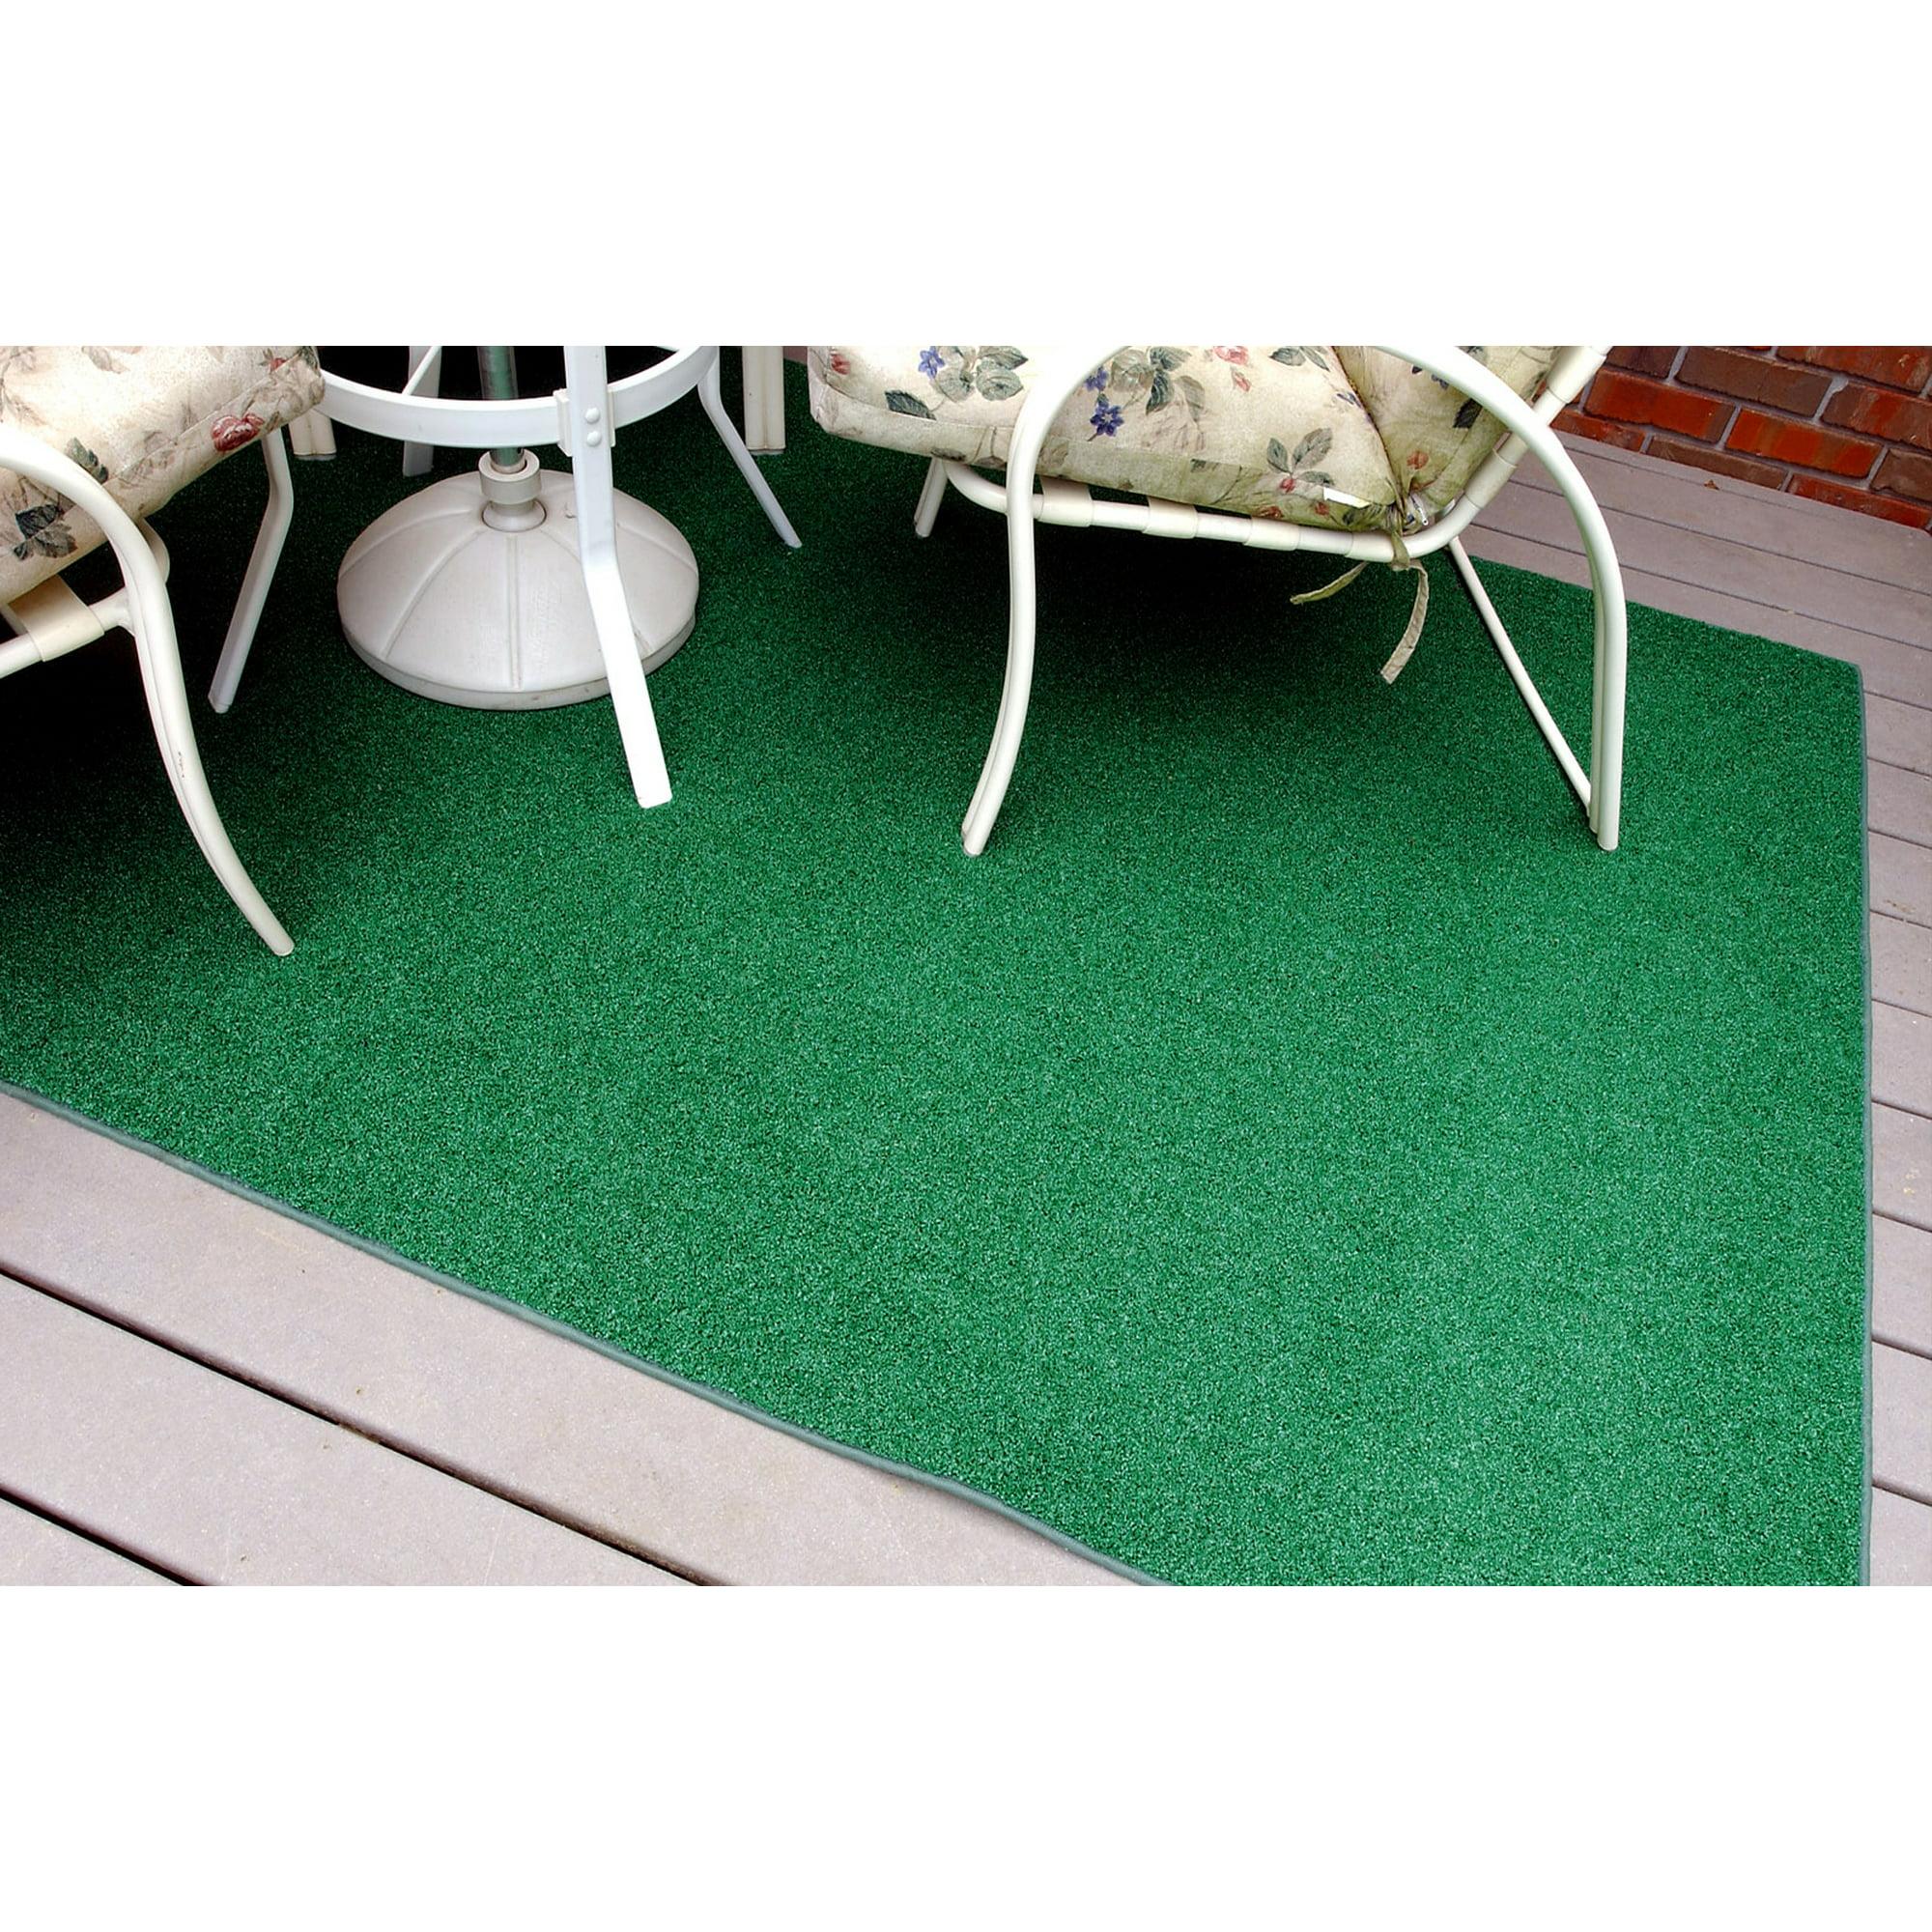 Garland Artificial Grass Green Indoor Outdoor Area Rug 4 X 6 Walmart Com Walmart Com